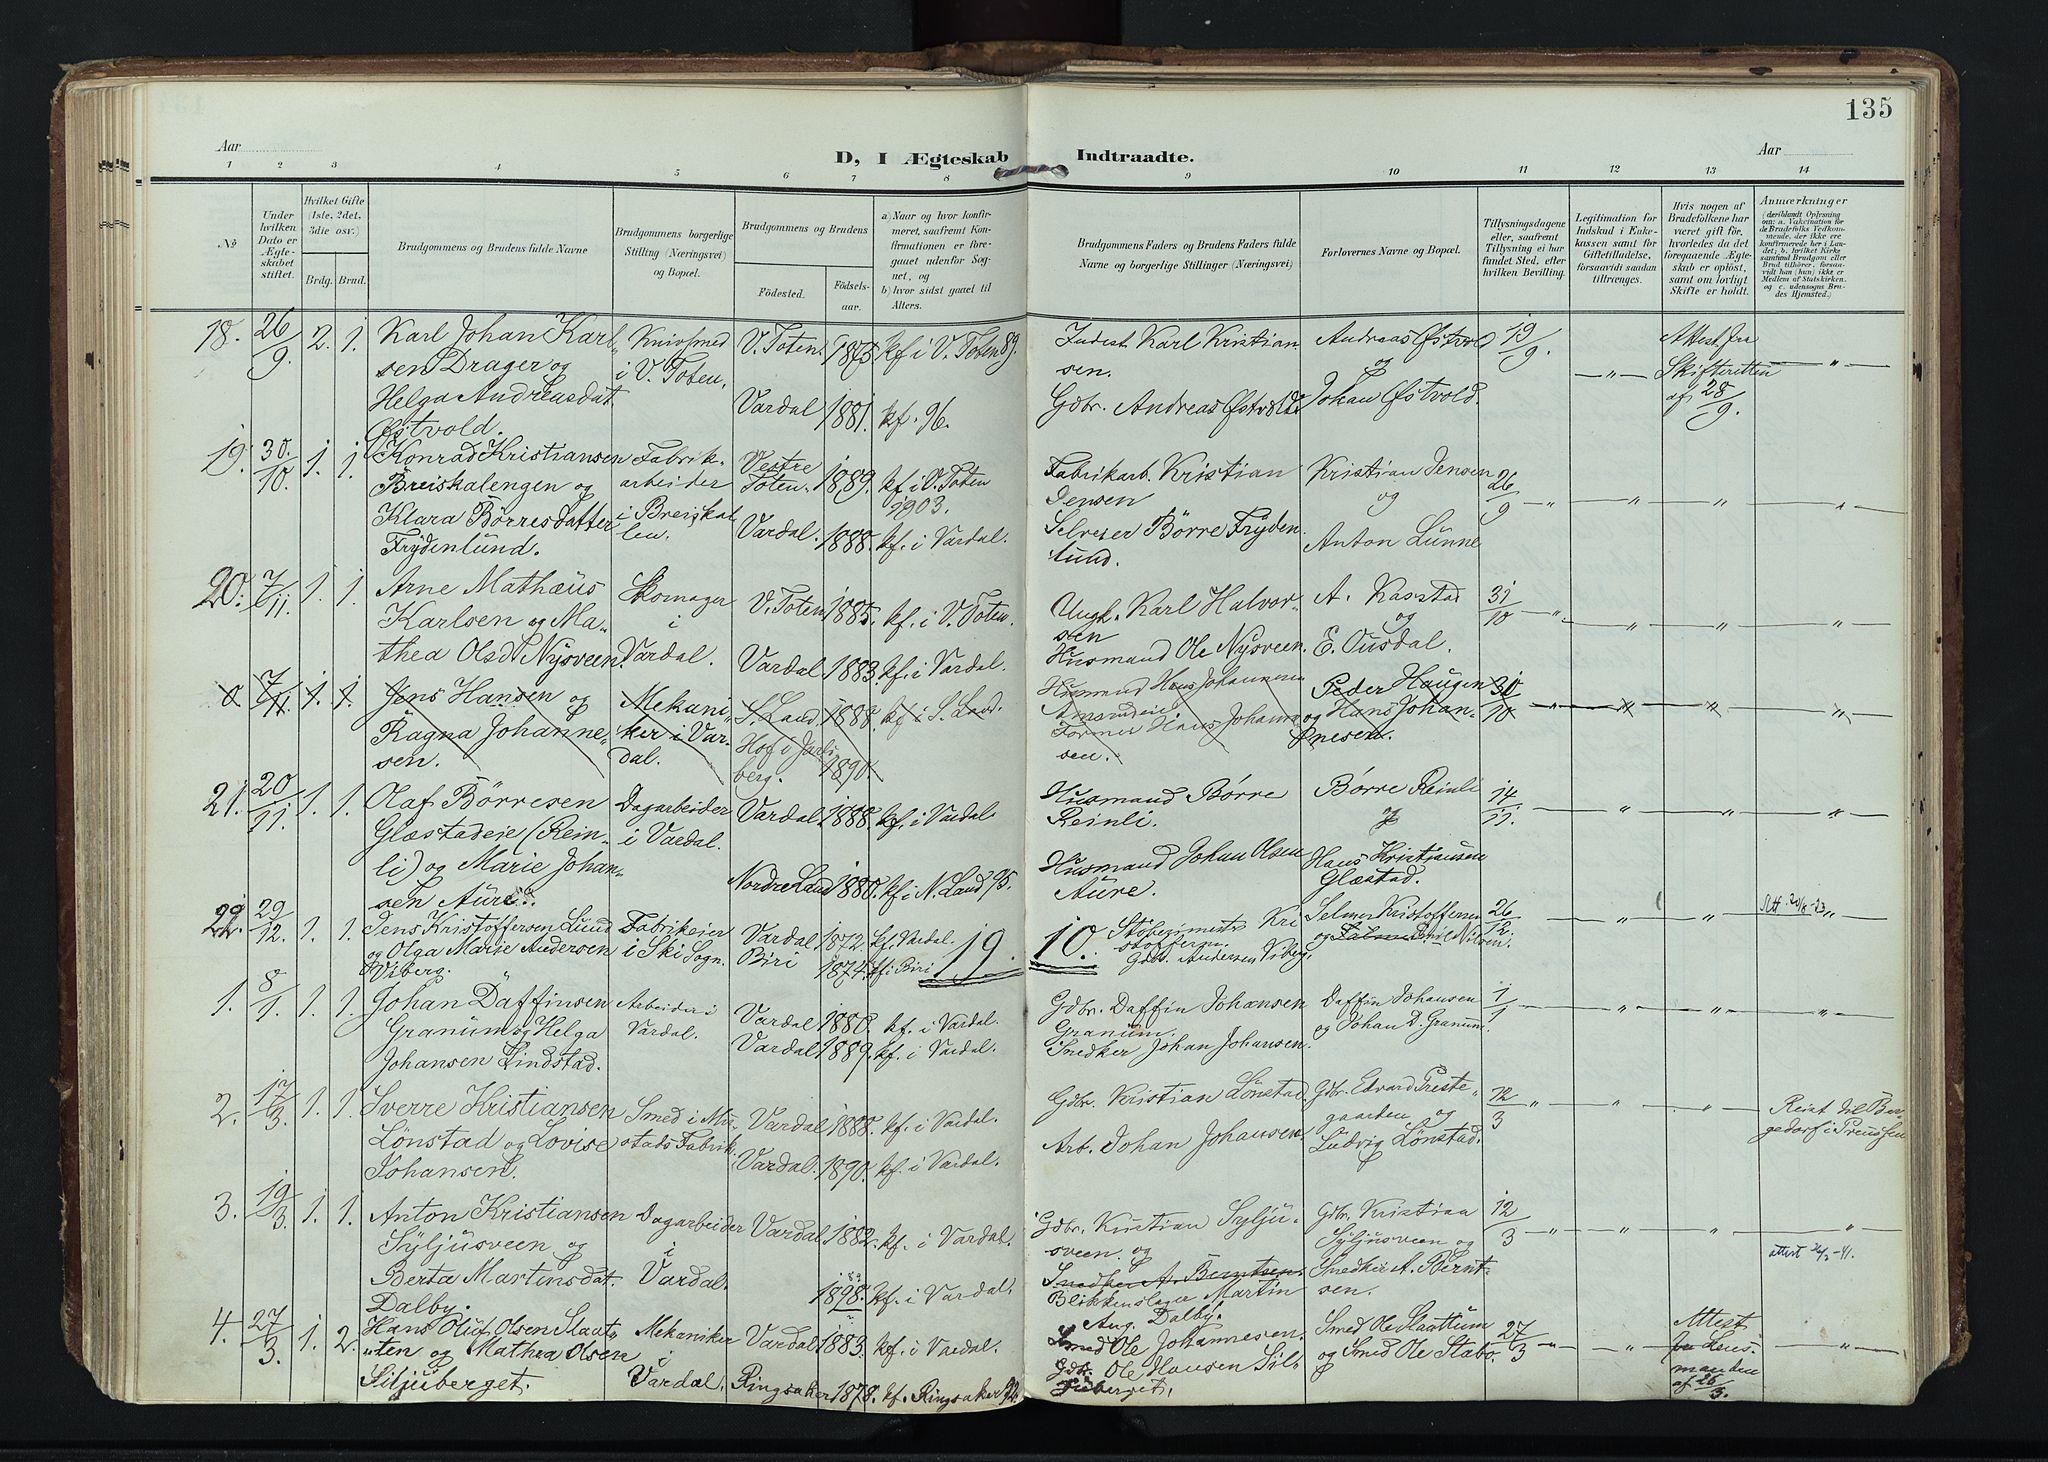 SAH, Vardal prestekontor, H/Ha/Haa/L0020: Ministerialbok nr. 20, 1907-1921, s. 135